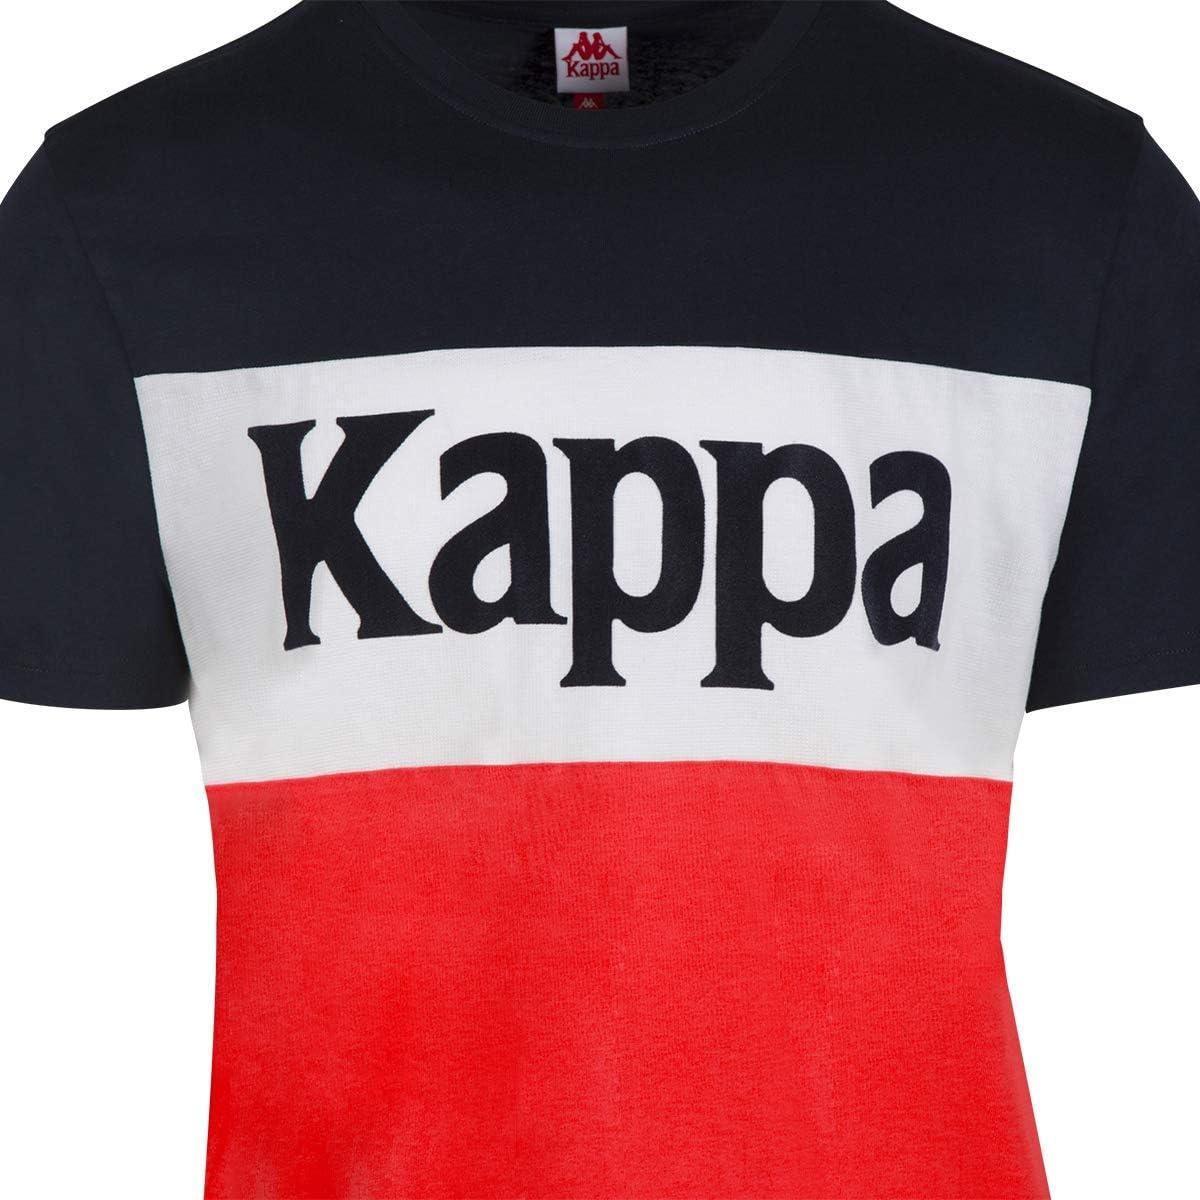 Camiseta Manga Corta Hombre Kappa Irwing